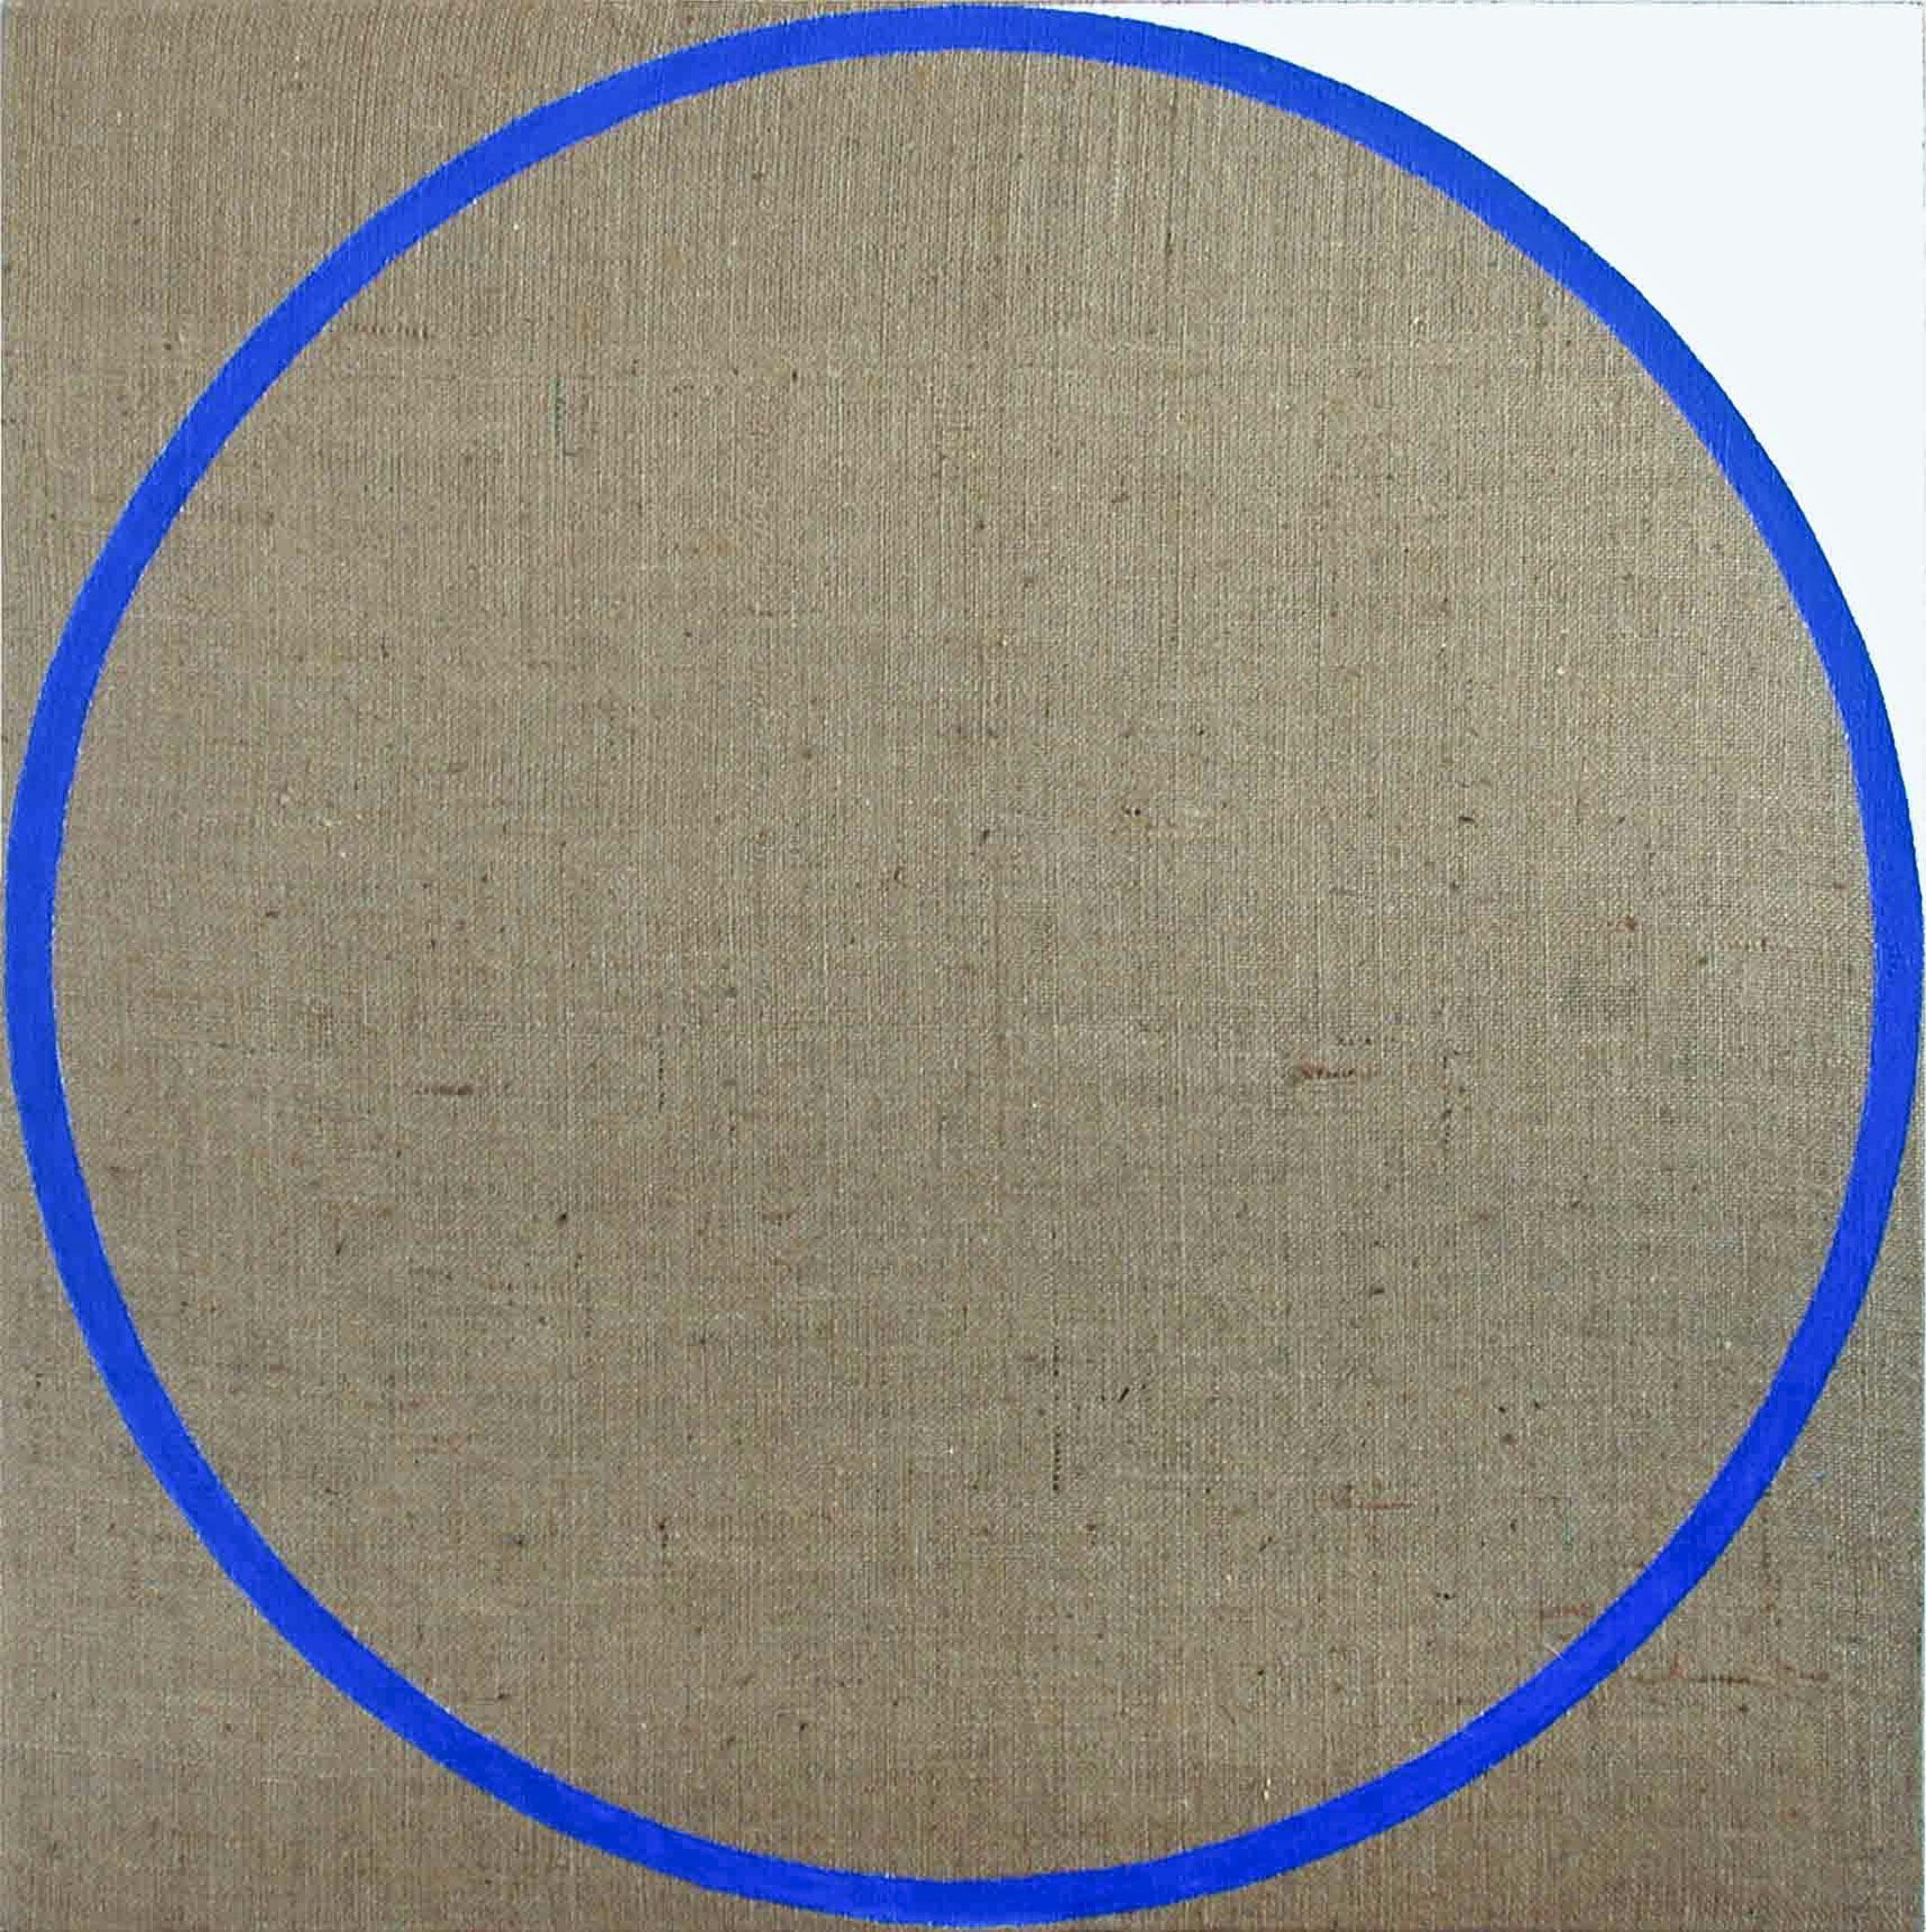 modri krog platno 100 x 100 cm